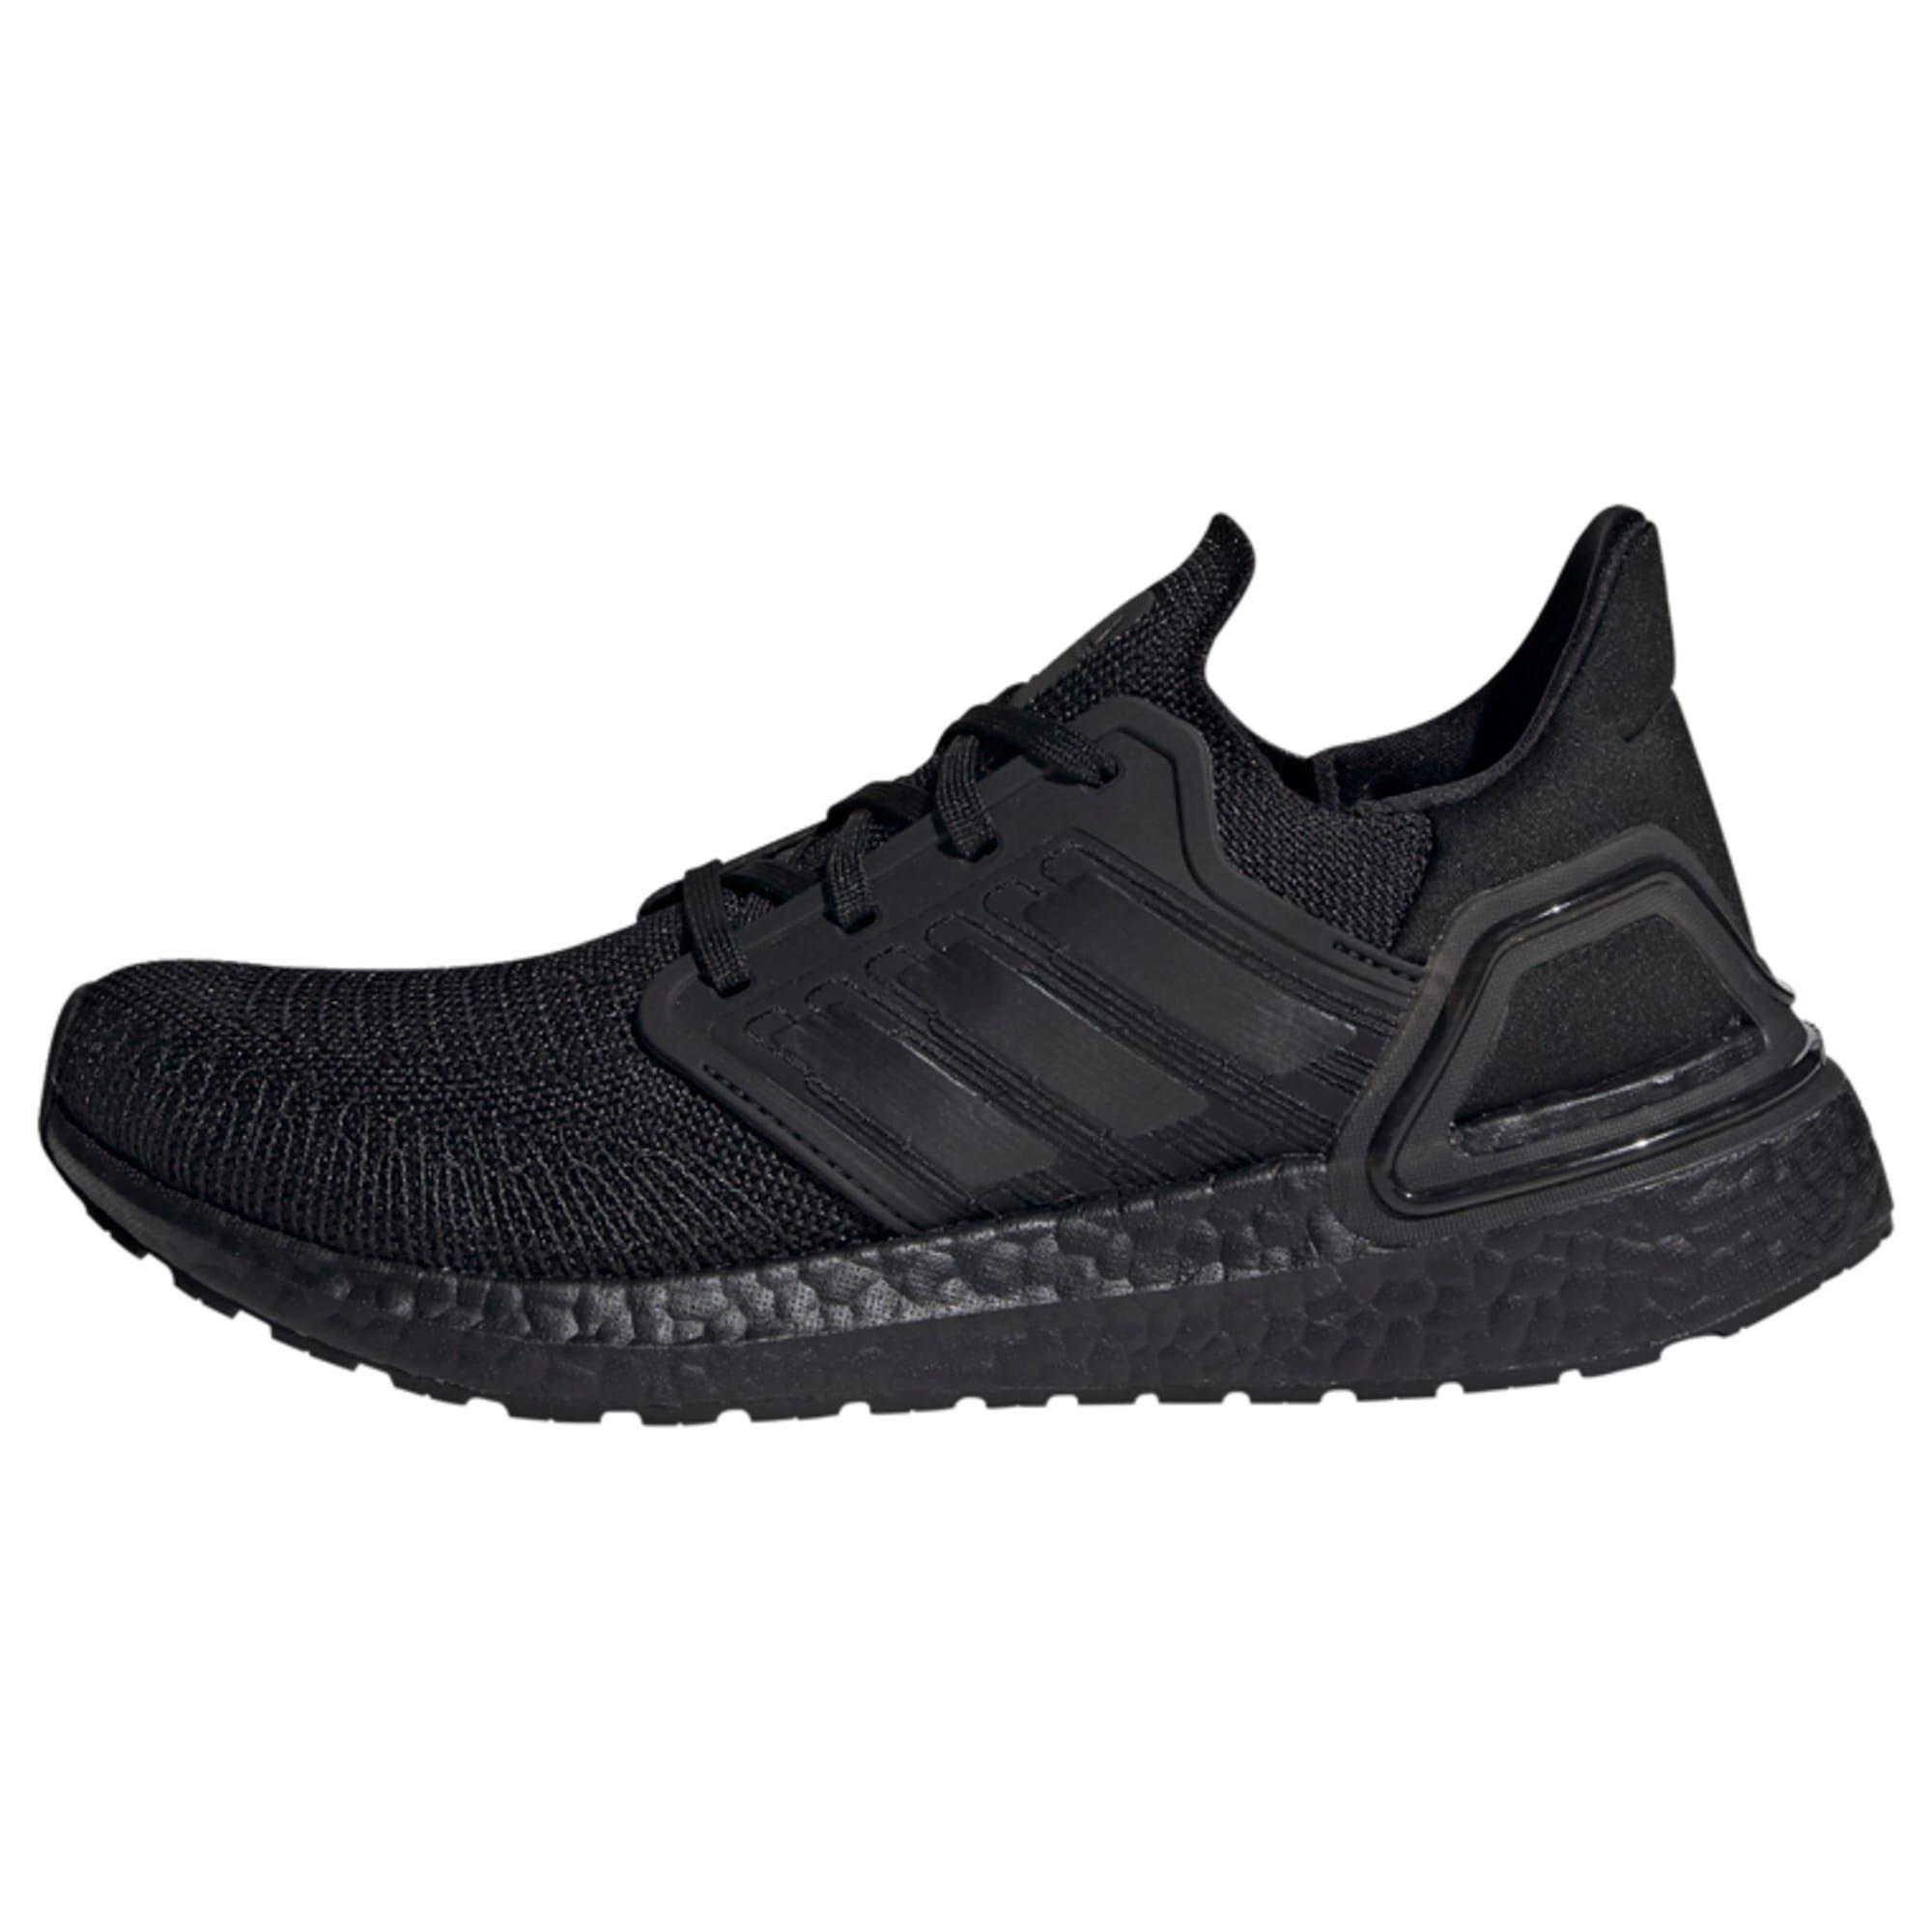 adidas Performance »Ultraboost 20 Schuh« Laufschuh UltraBoost;PrimeBlue;Parley online kaufen | OTTO